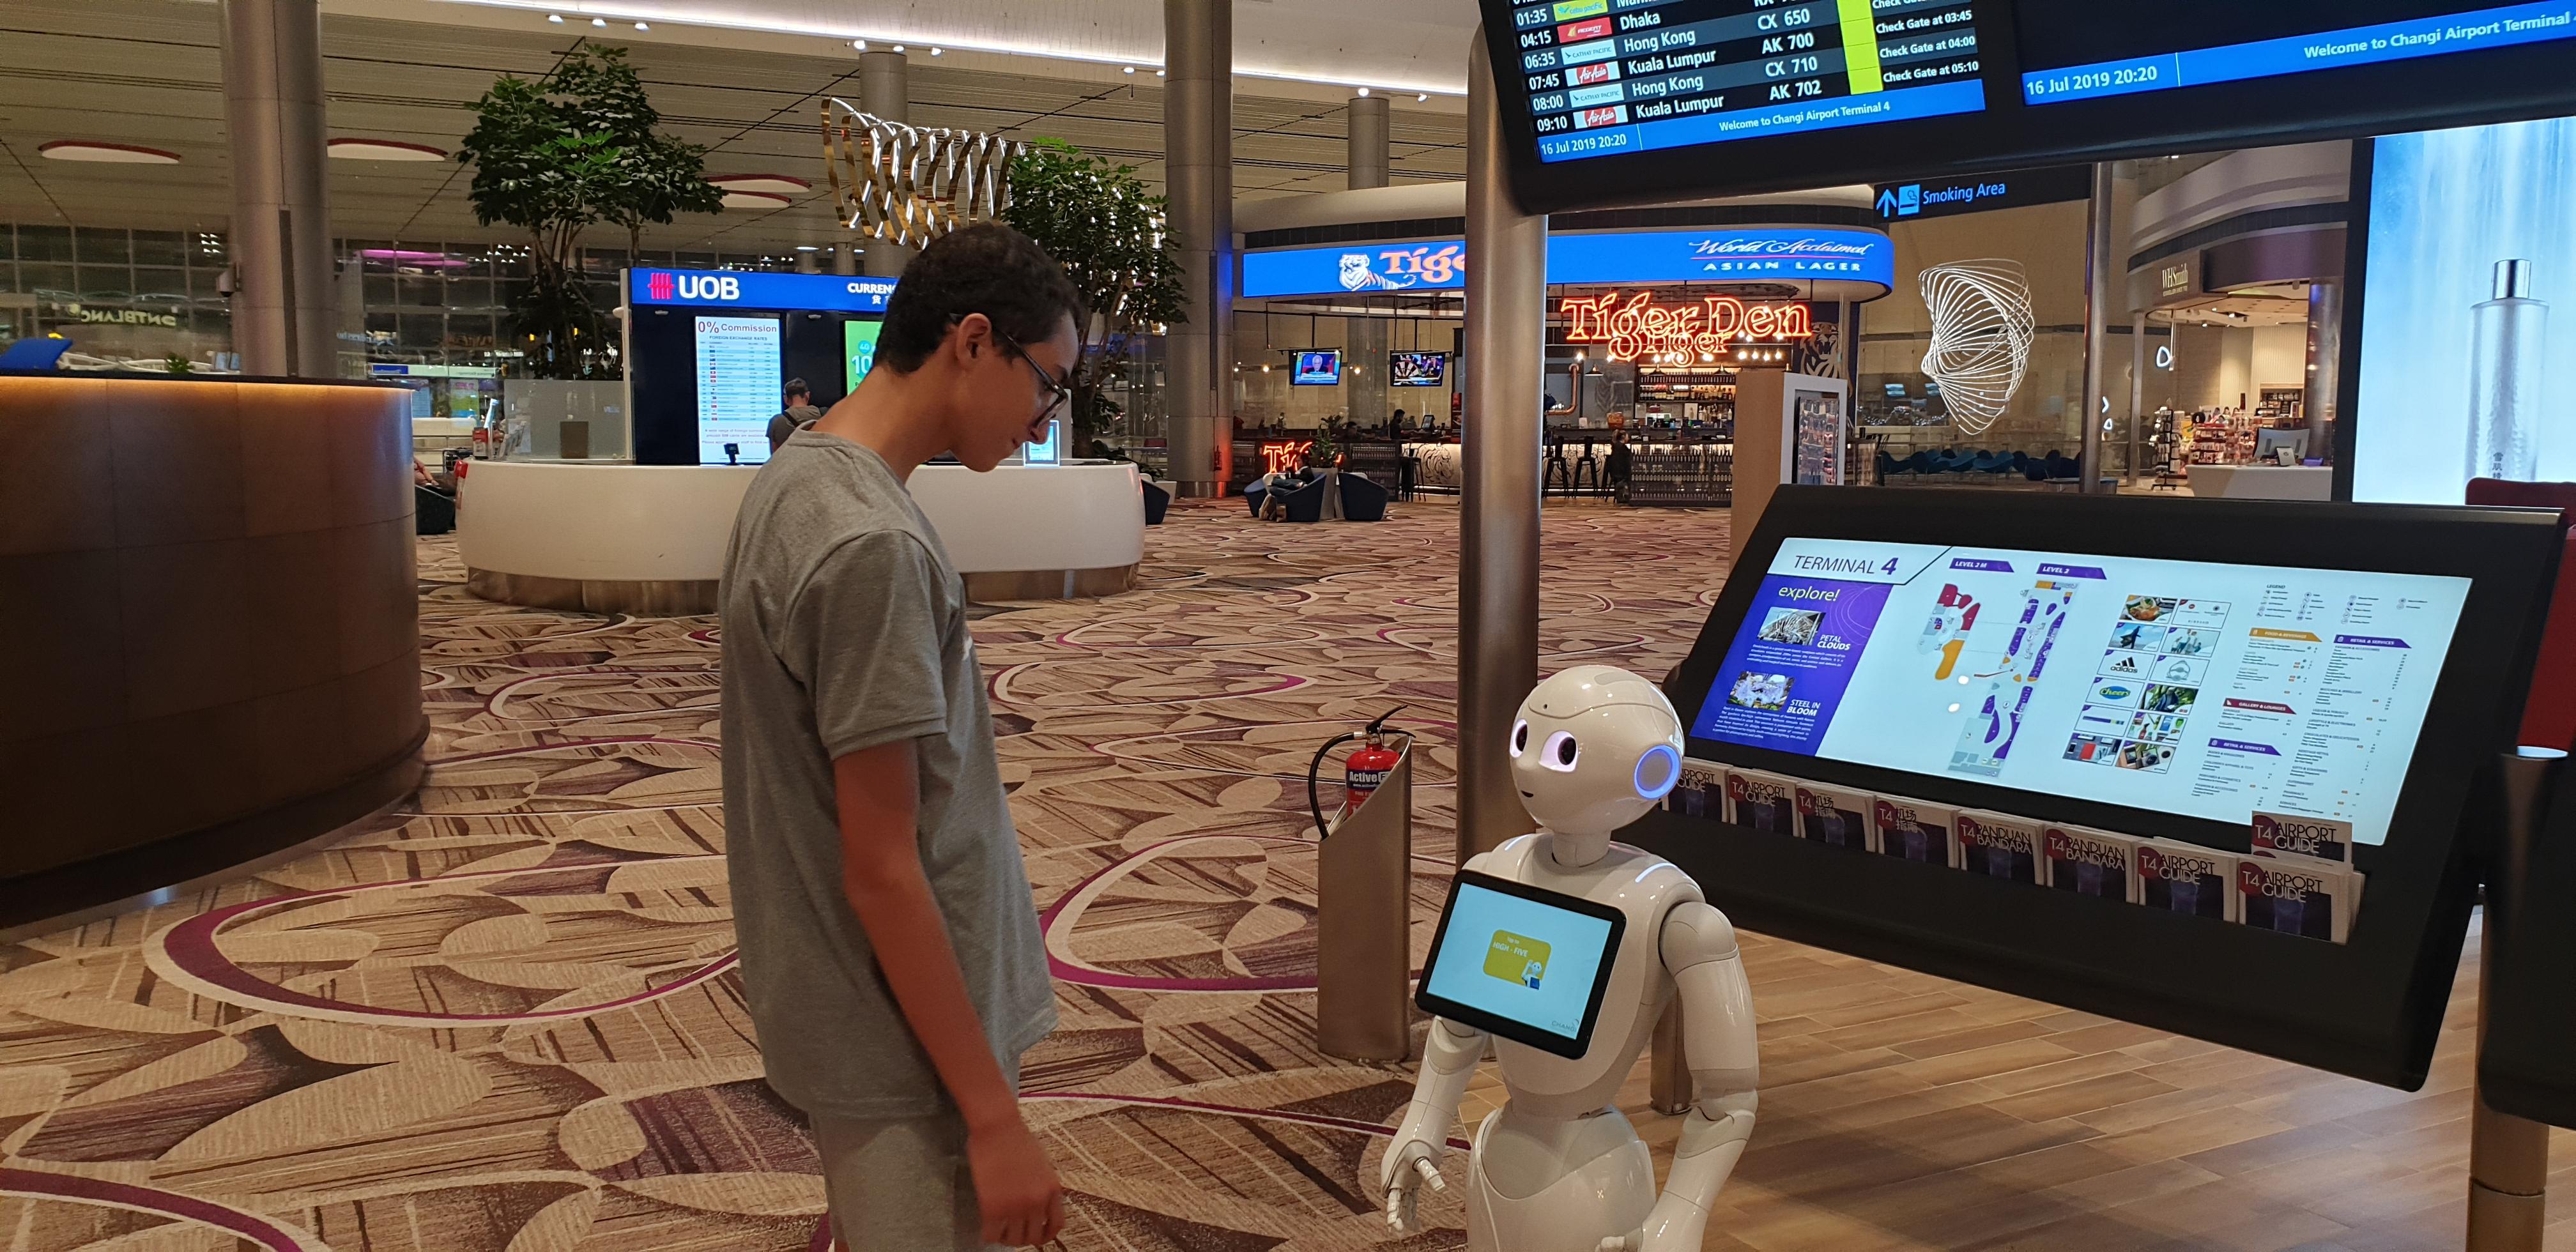 terminal 4 aéroport de changi singapour Robot